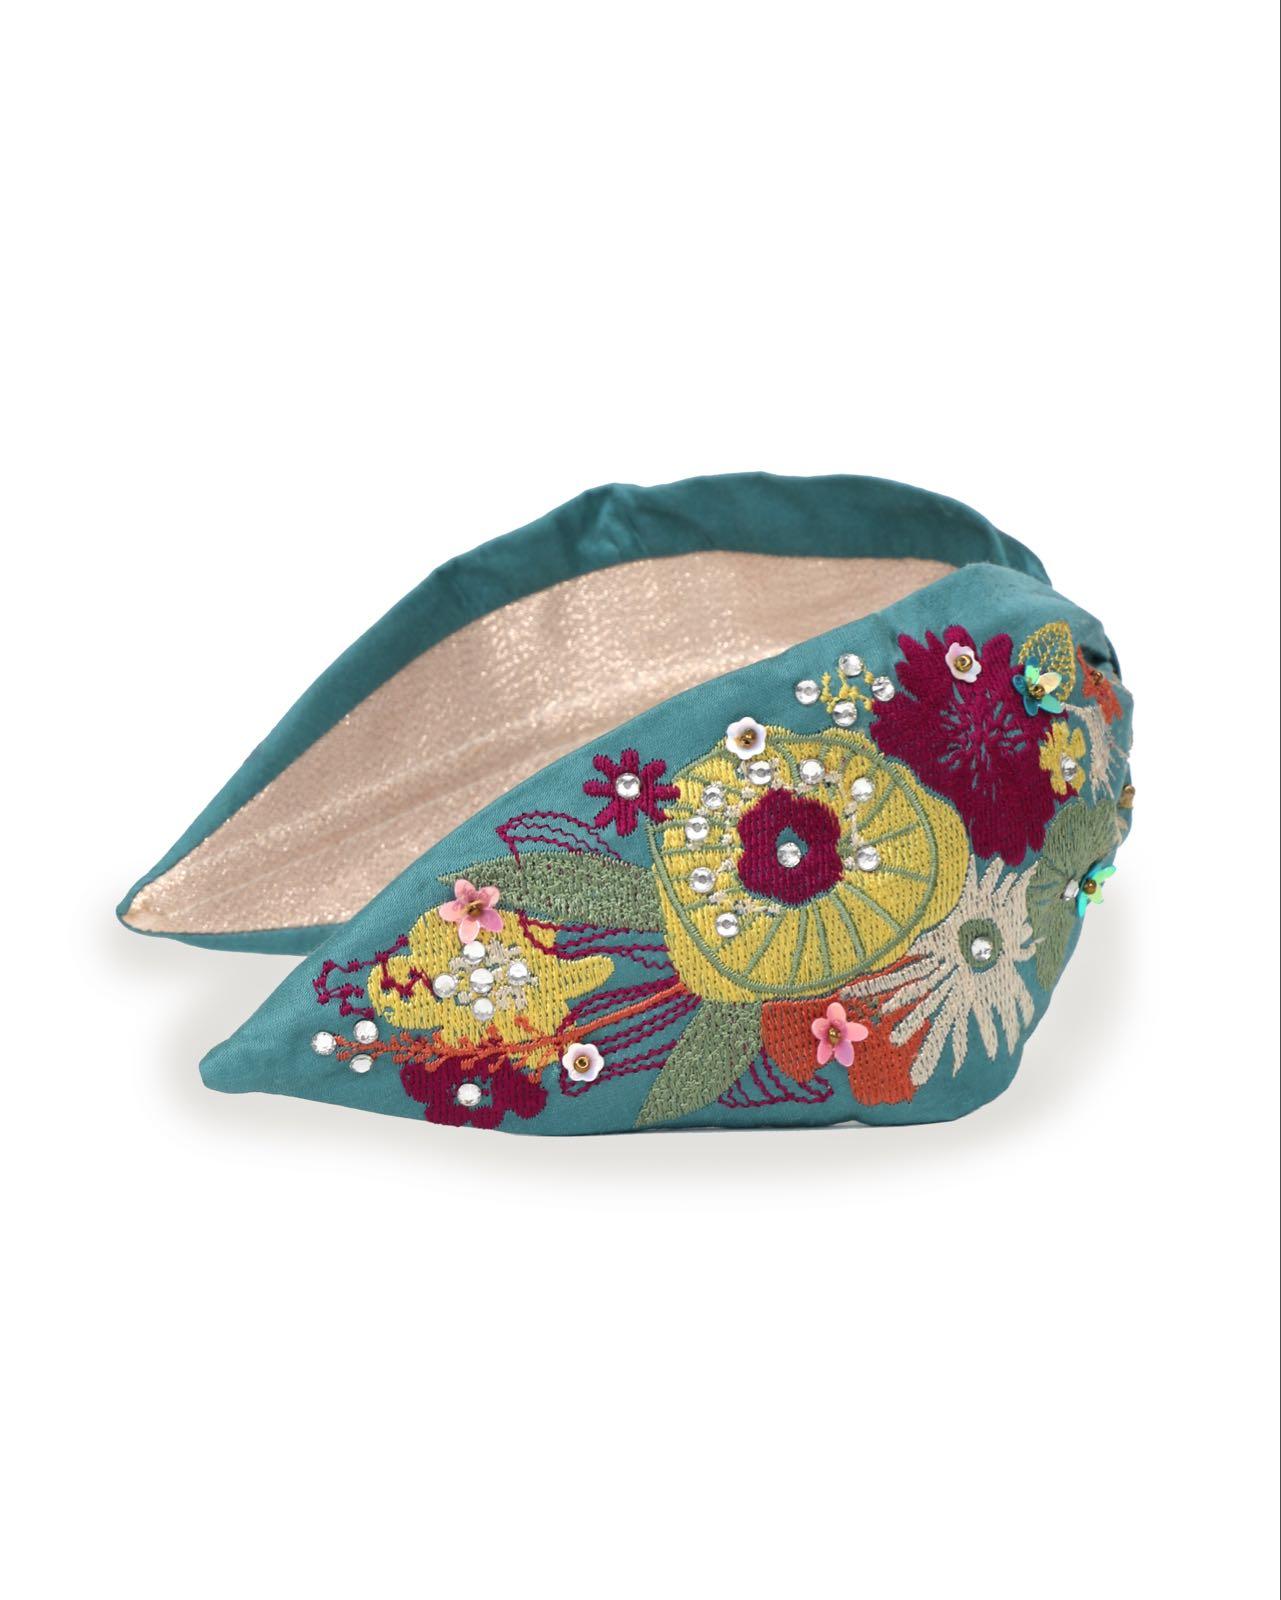 Powder floral turquoise headband